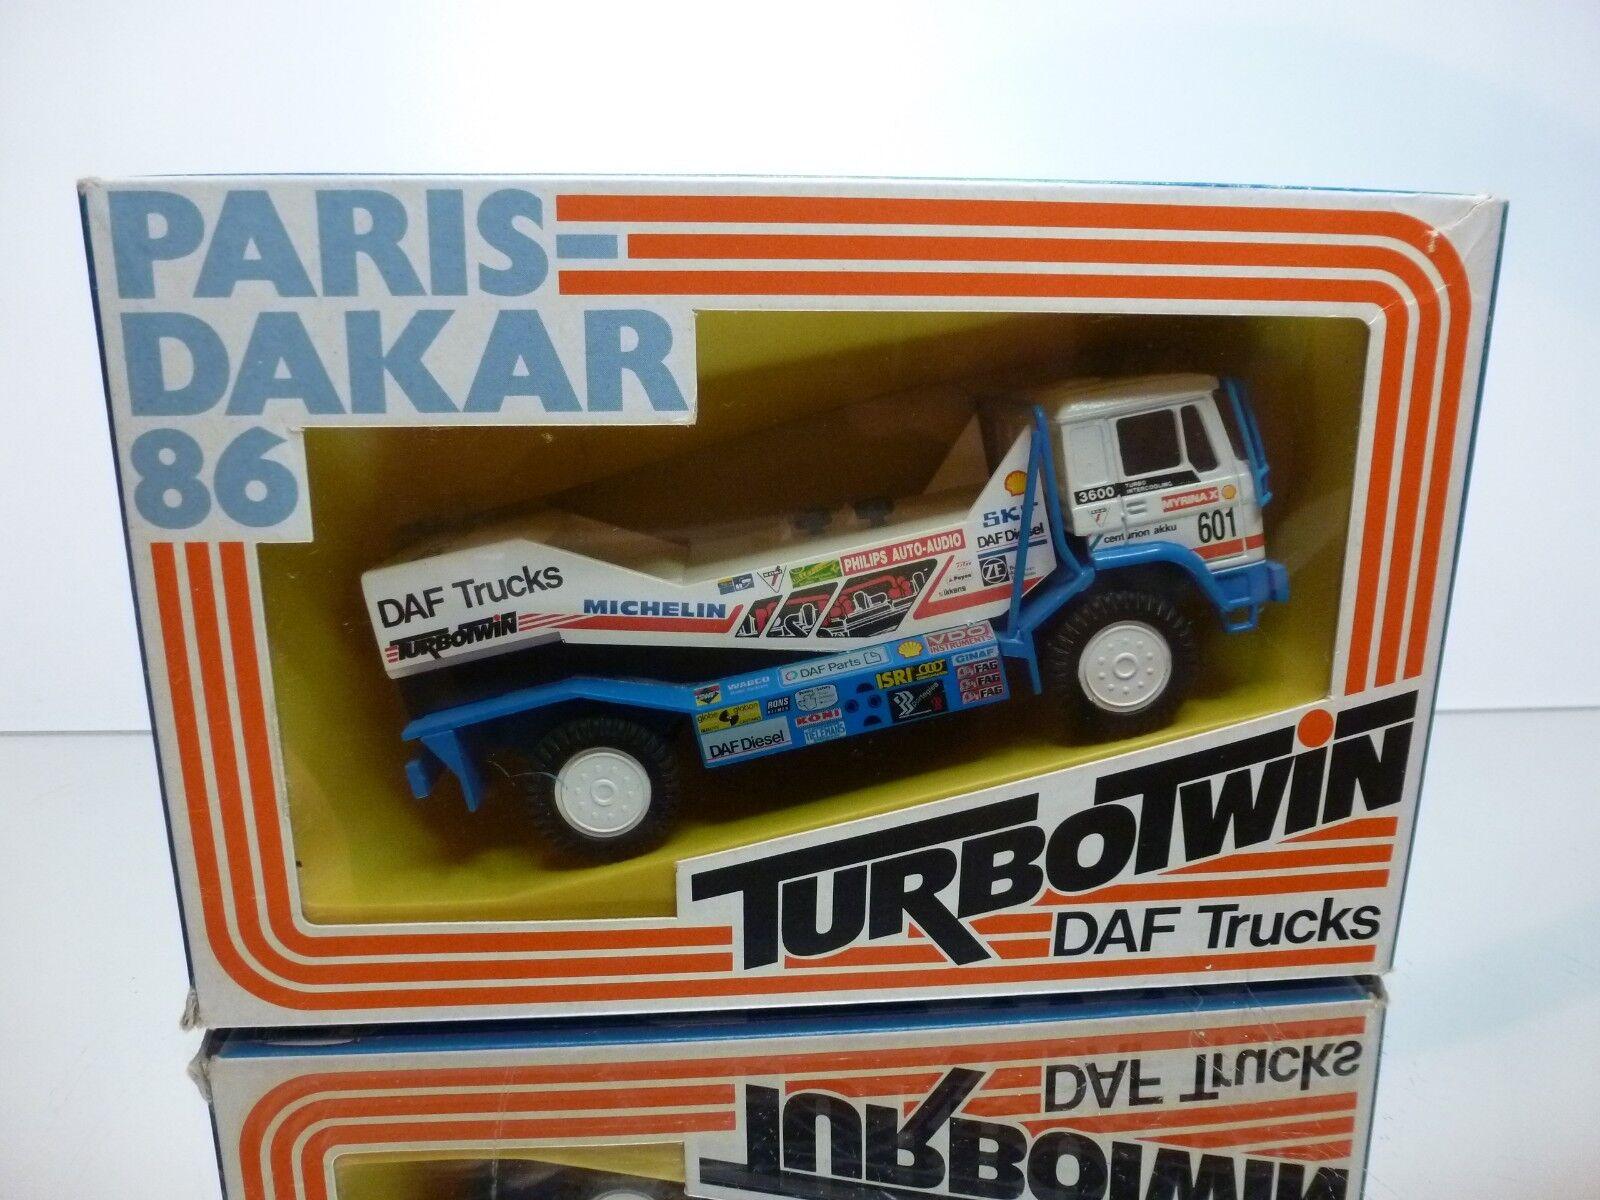 PORTEGIES DAF 3600 TURBOTWIN PARIS DAKAR 1986 DE ROOY - 1 50 - VERY GOOD IN BOX